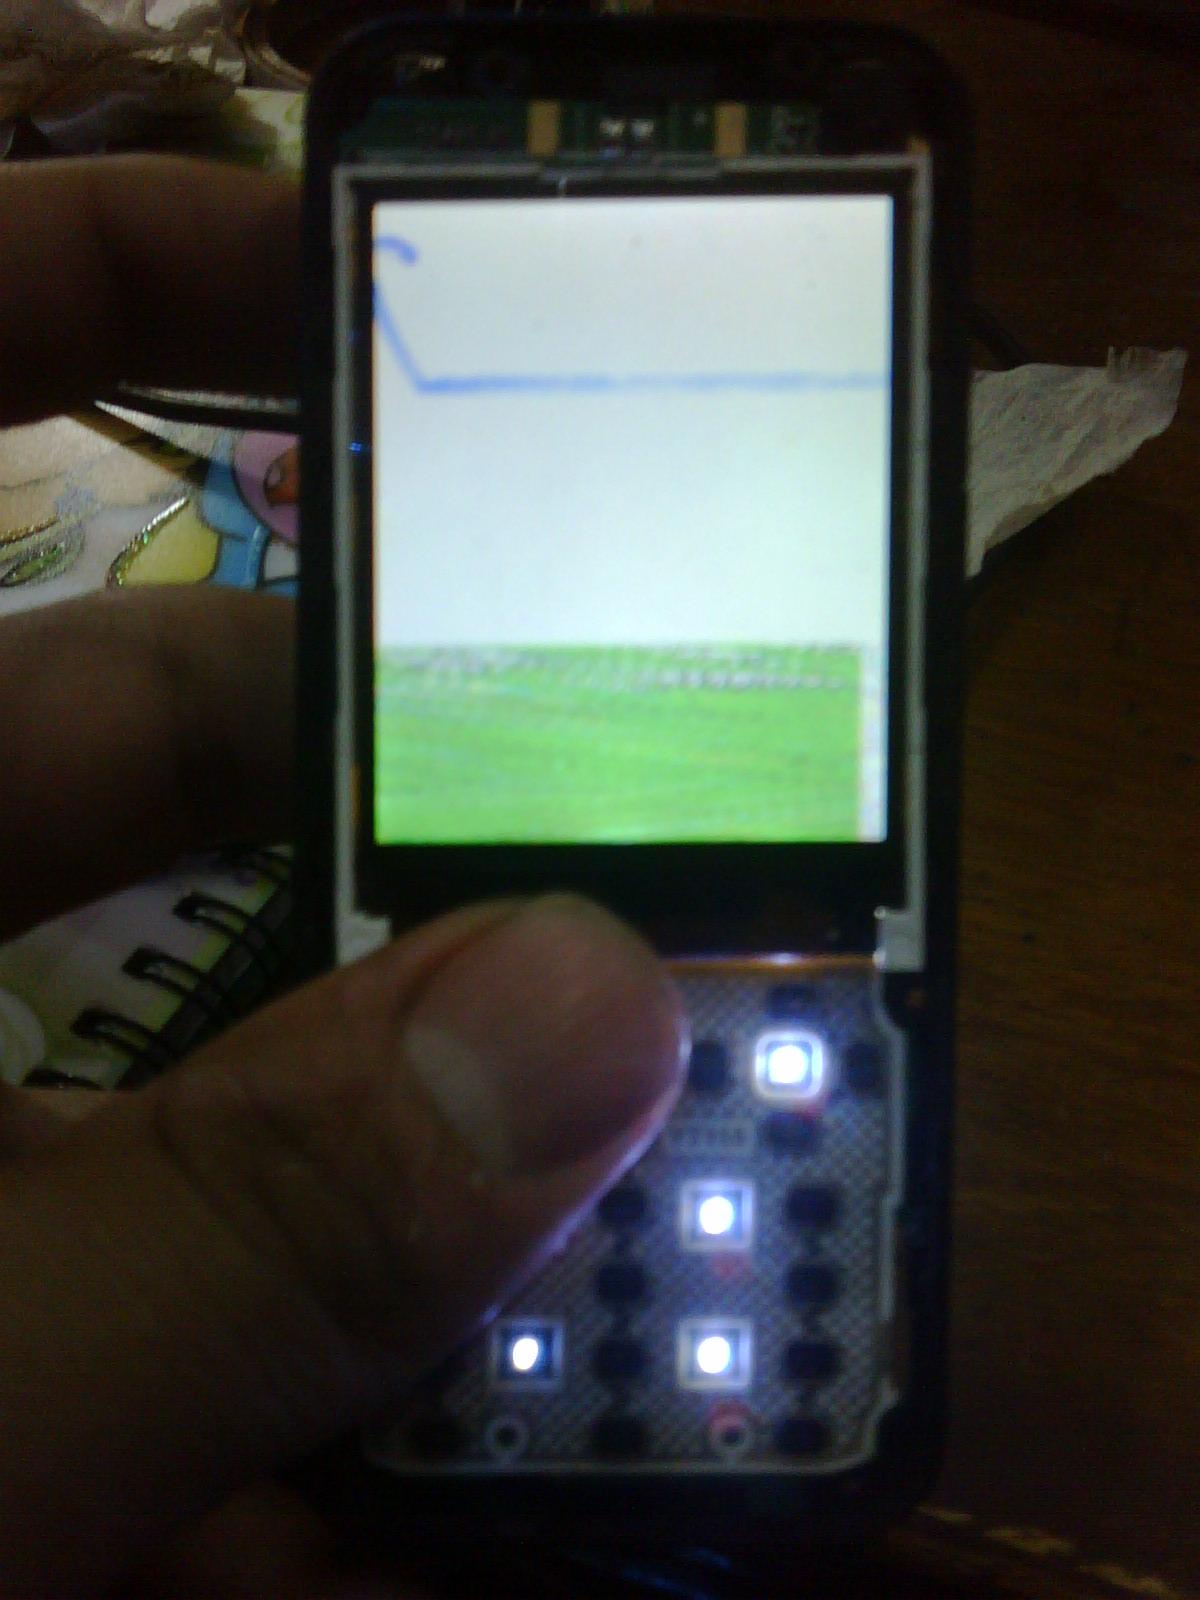 مشكله شاشه فى جهاز 6120 صينى